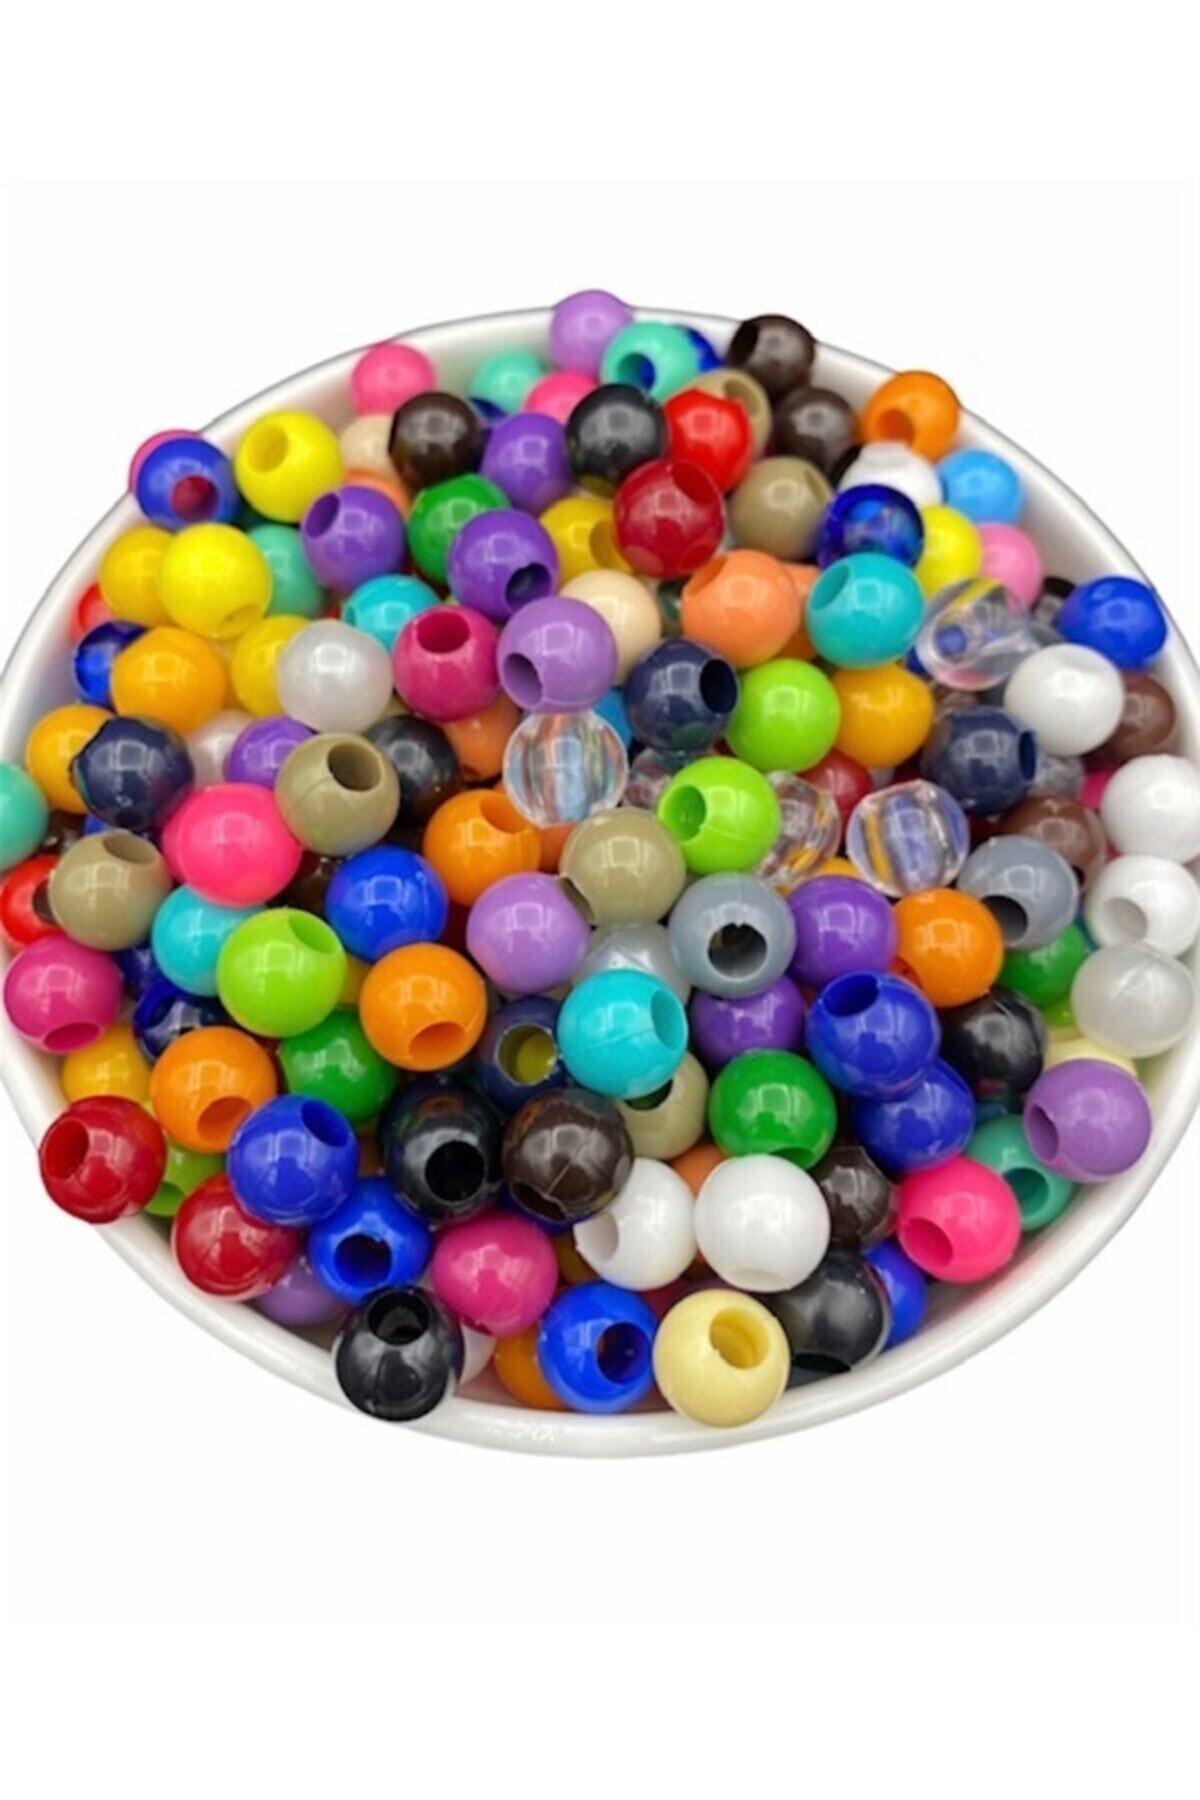 Hedef Bijuteri 10mm Karışık Renkli Plastik Boncuk,renkli Geniş Delik Makrome Boncuğu (100gr,~200 Adet Boncuk) 2